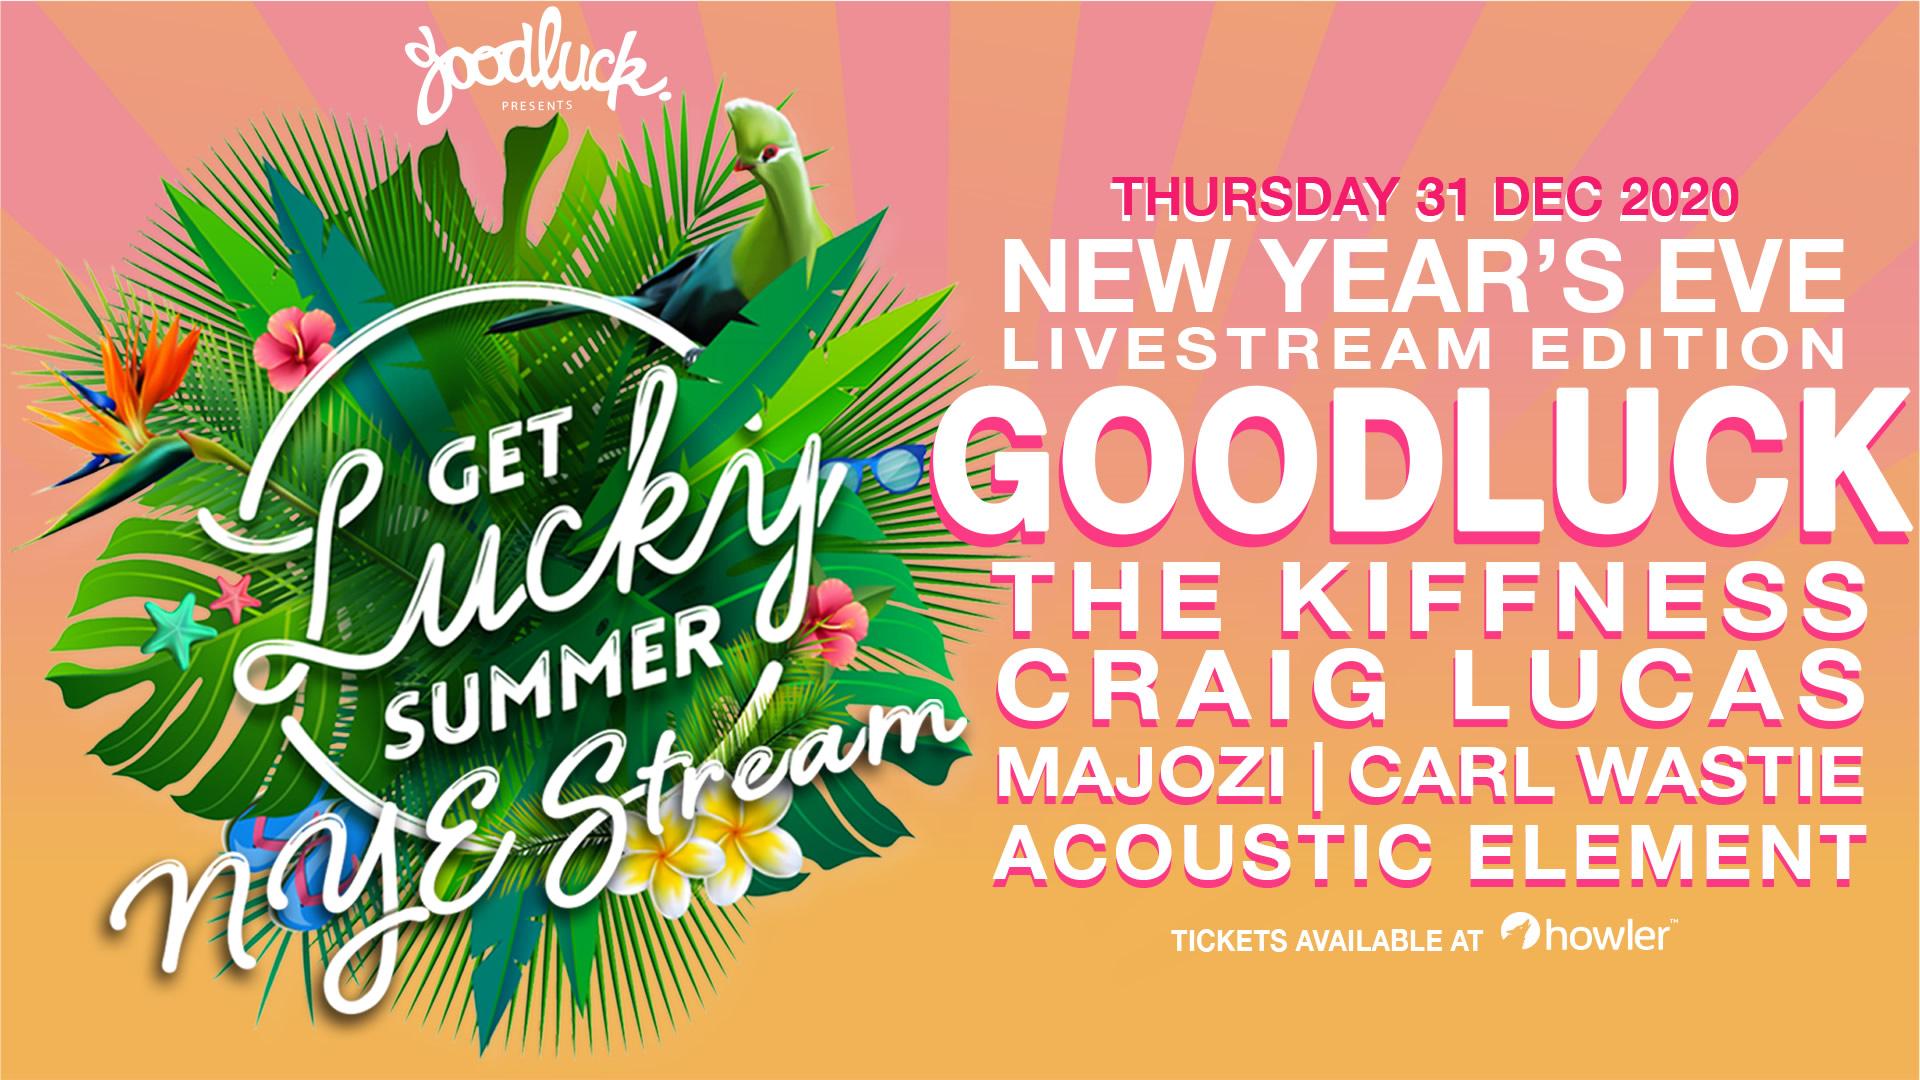 Get Lucky Summer NYE Event live stream